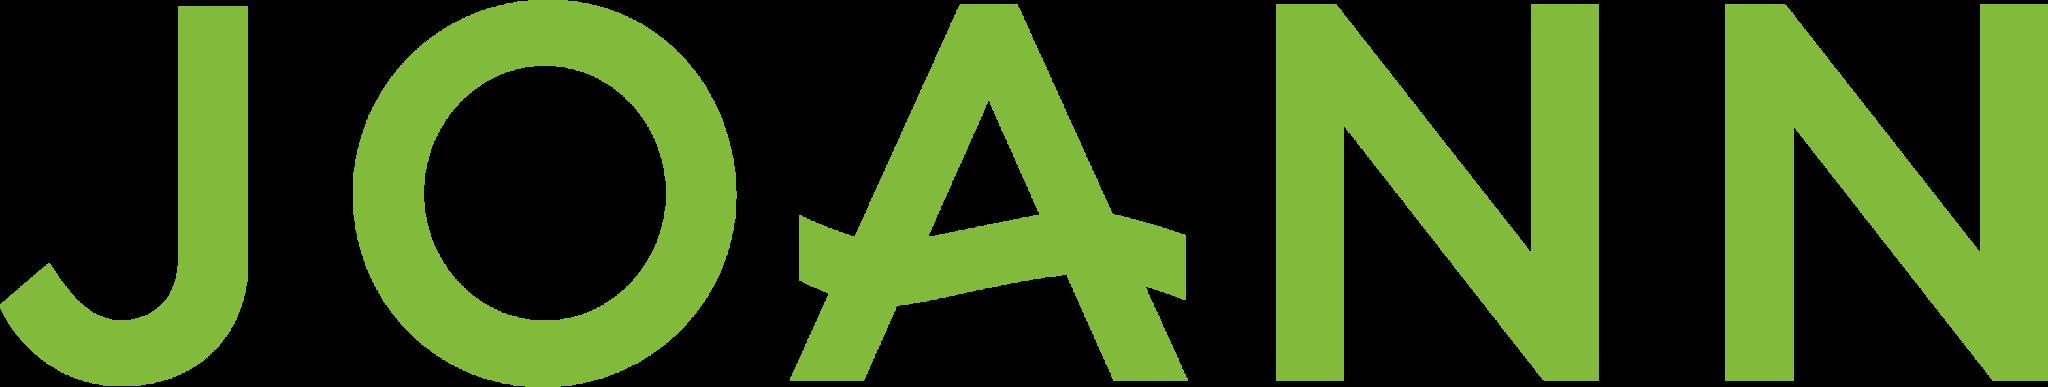 JOANN logo Green.